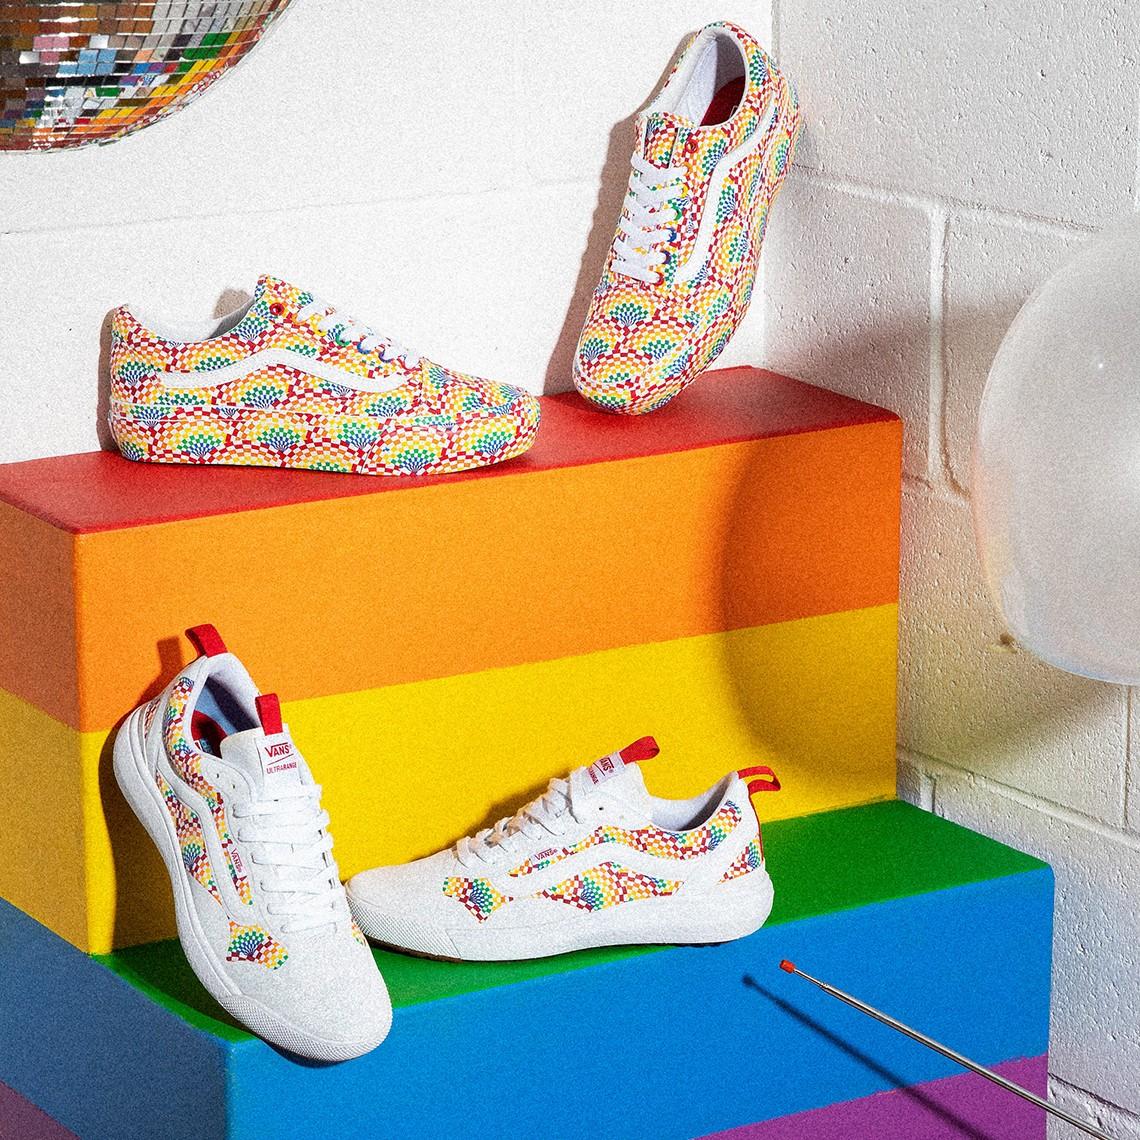 Vans,LGBTQ  亮眼彩虹配色!Vans 全新「彩虹」系列实物曝光!